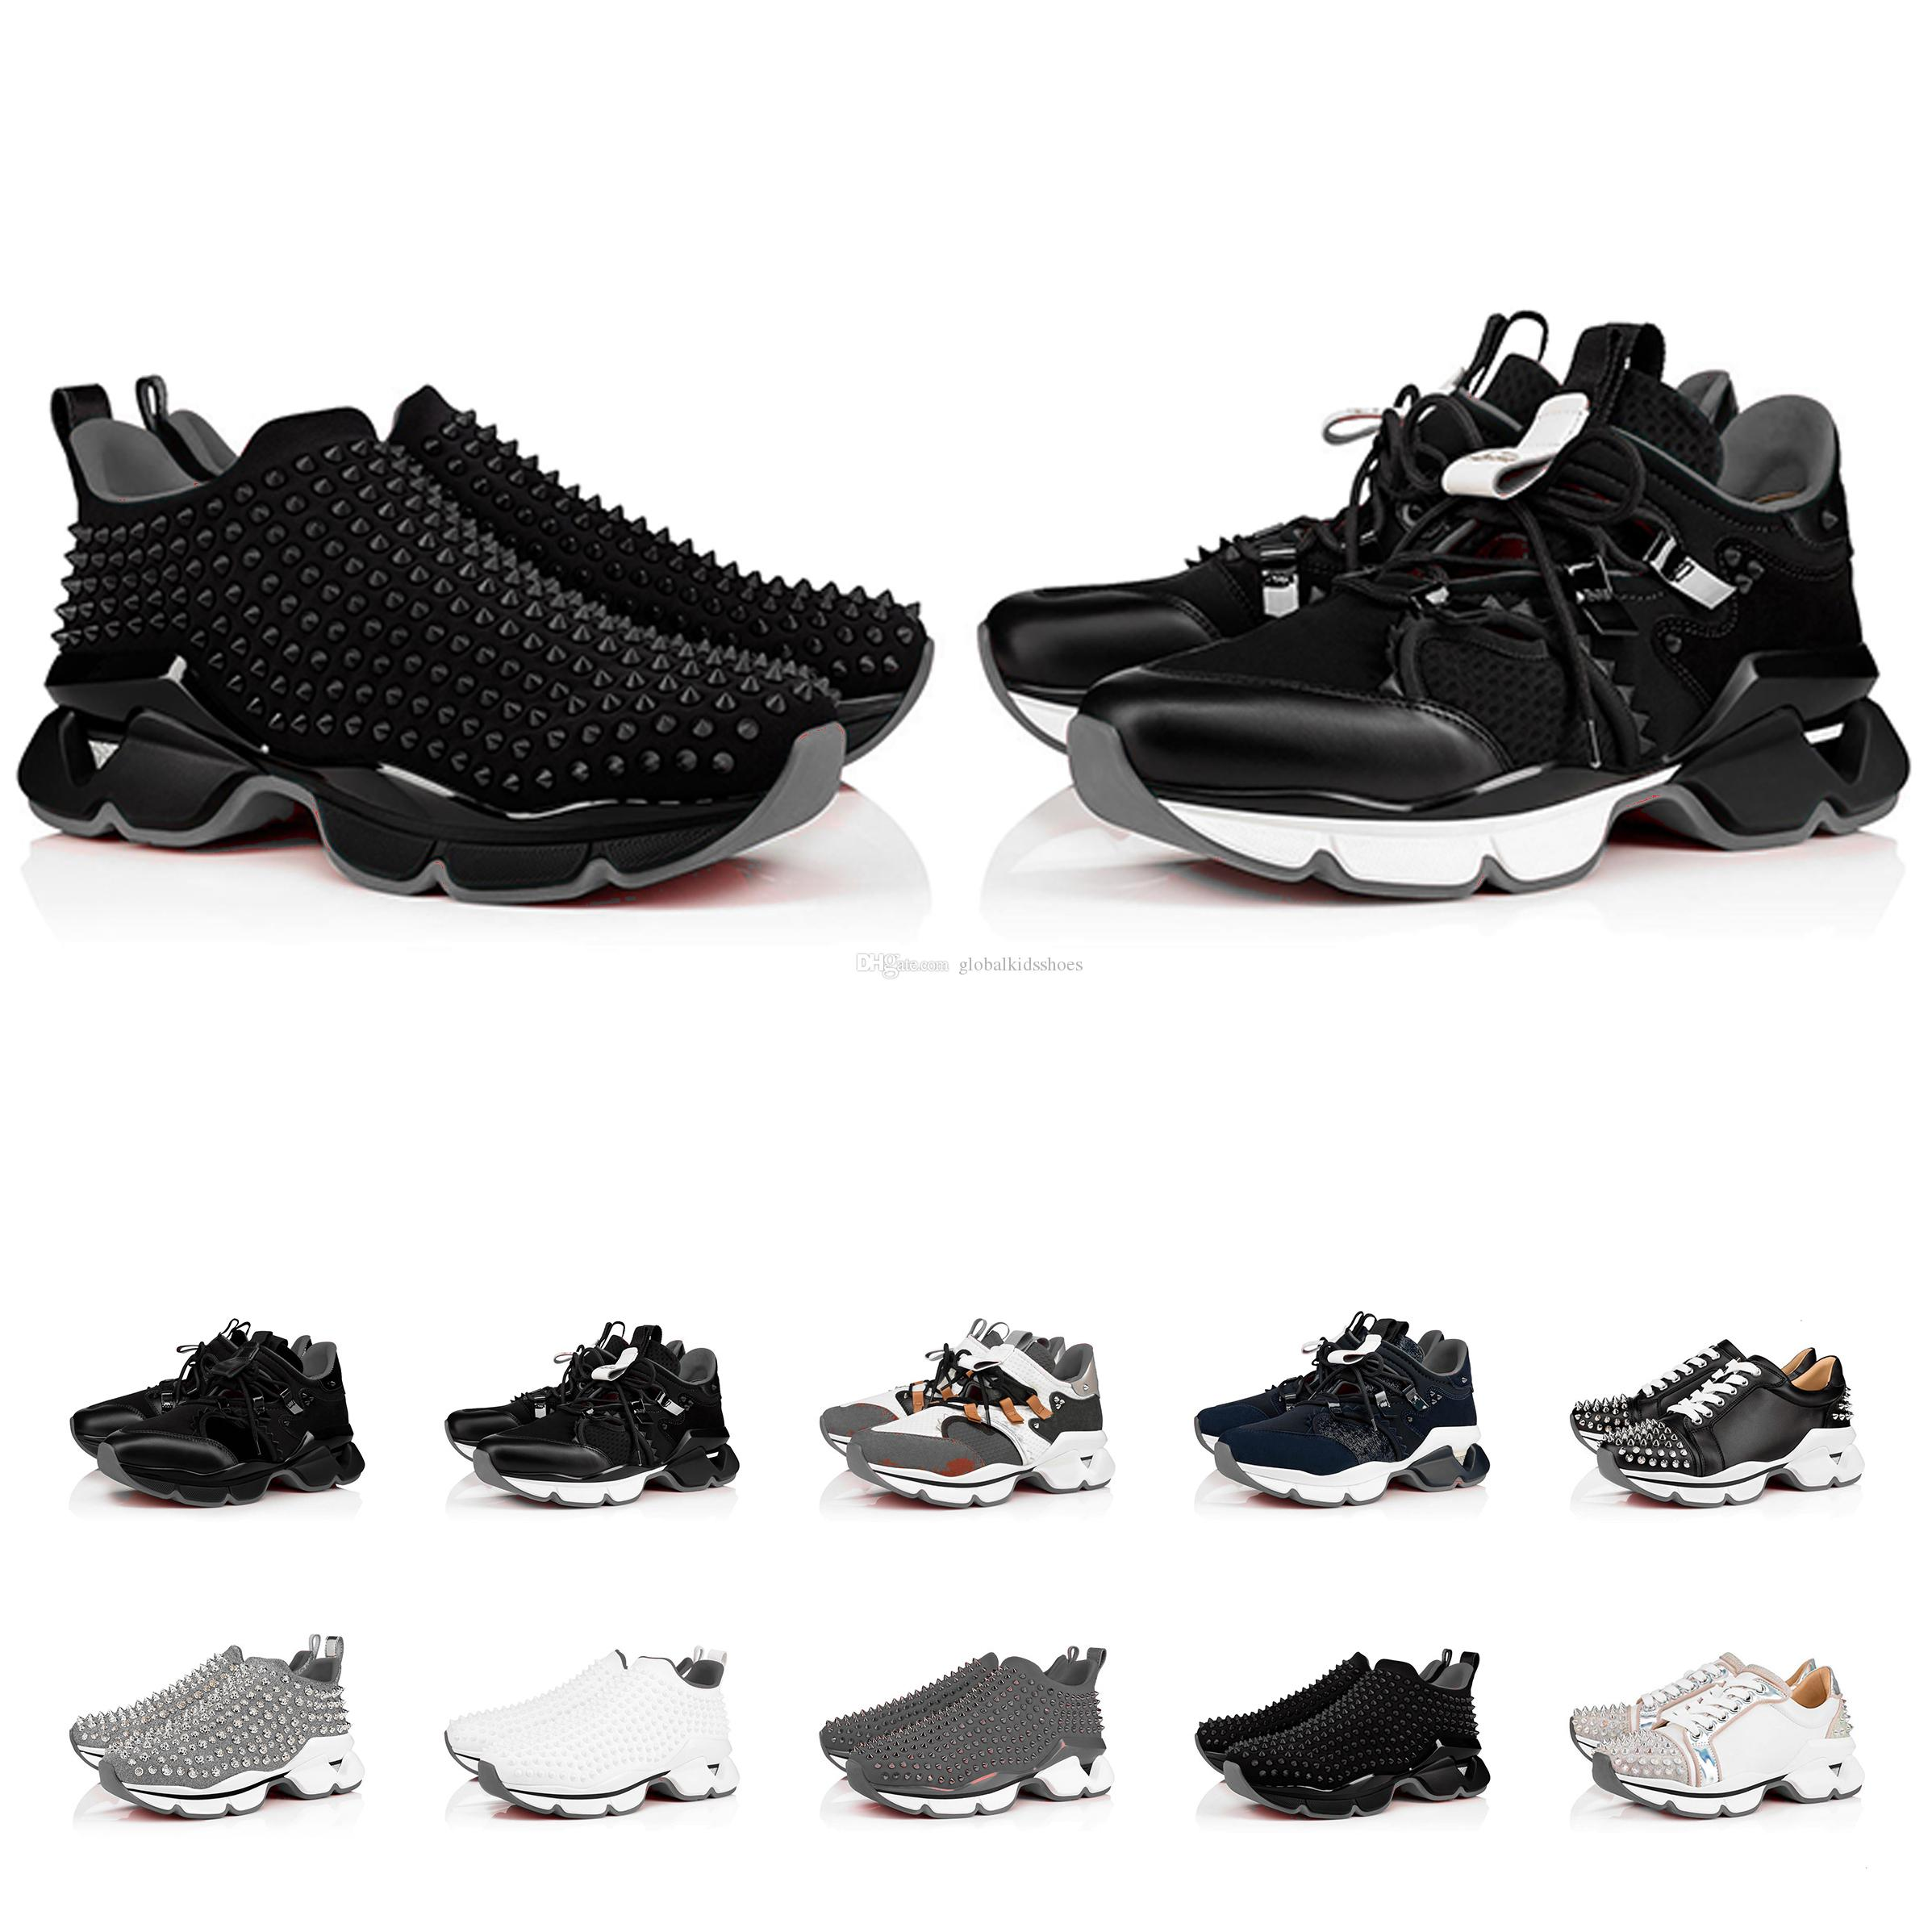 Luxurys مصممين أحذية أحذية حذاء رياضة رجالية أحذية رجال مدربين رجالي عداء الأولاد الأحذية السوداء شقة عالية أعلى الجوارب حجم US5-US13